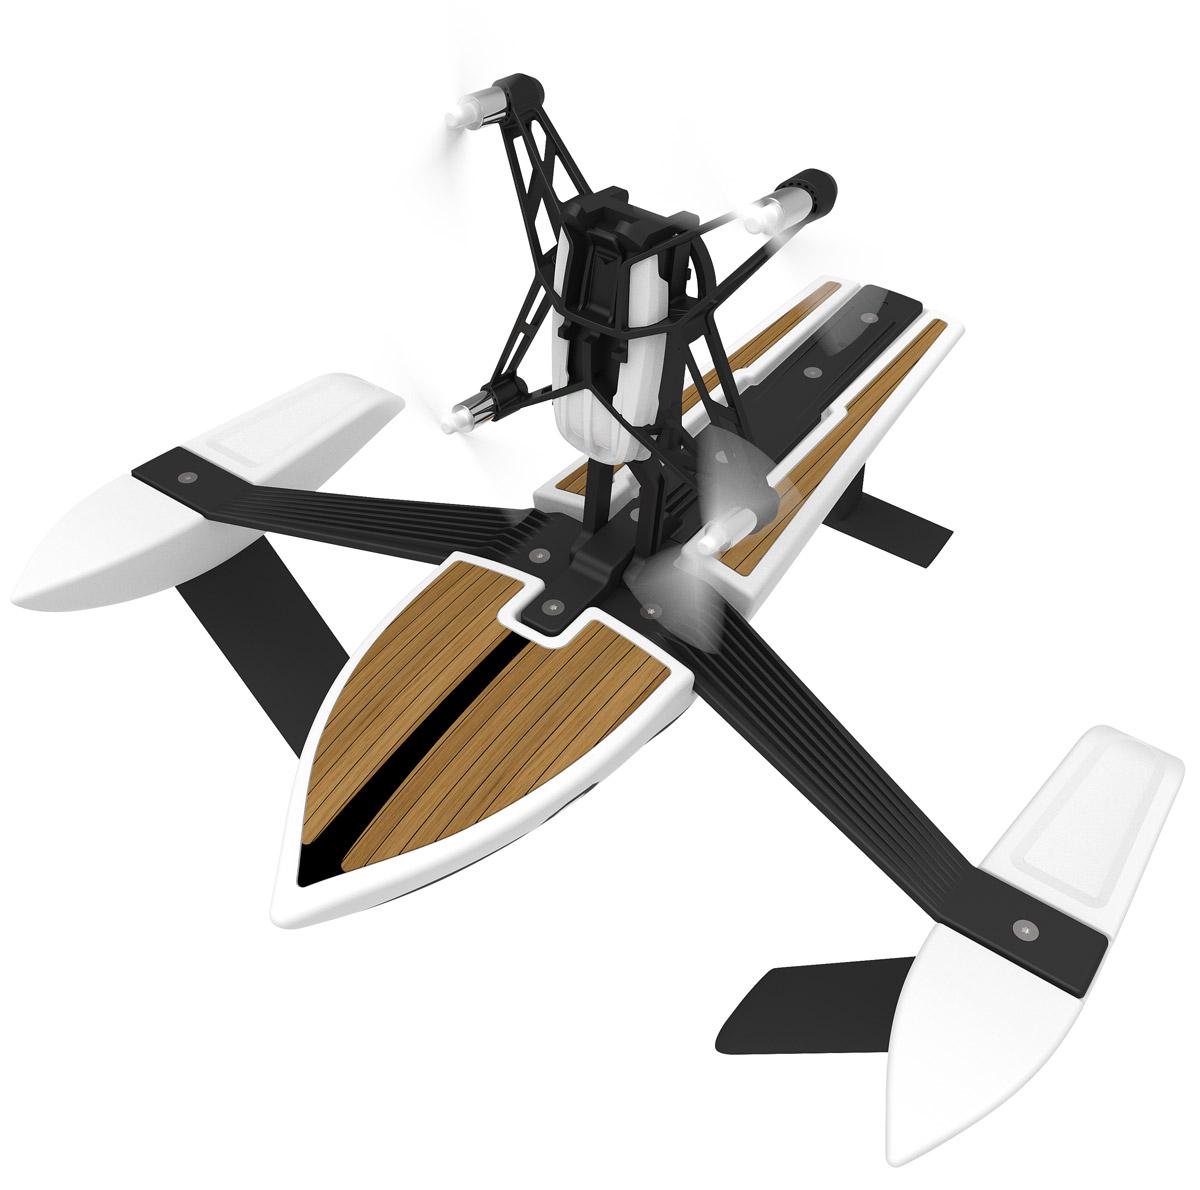 Parrot Квадрокоптер на радиоуправлении Minidrone Hydrofoil NewZ и корабль